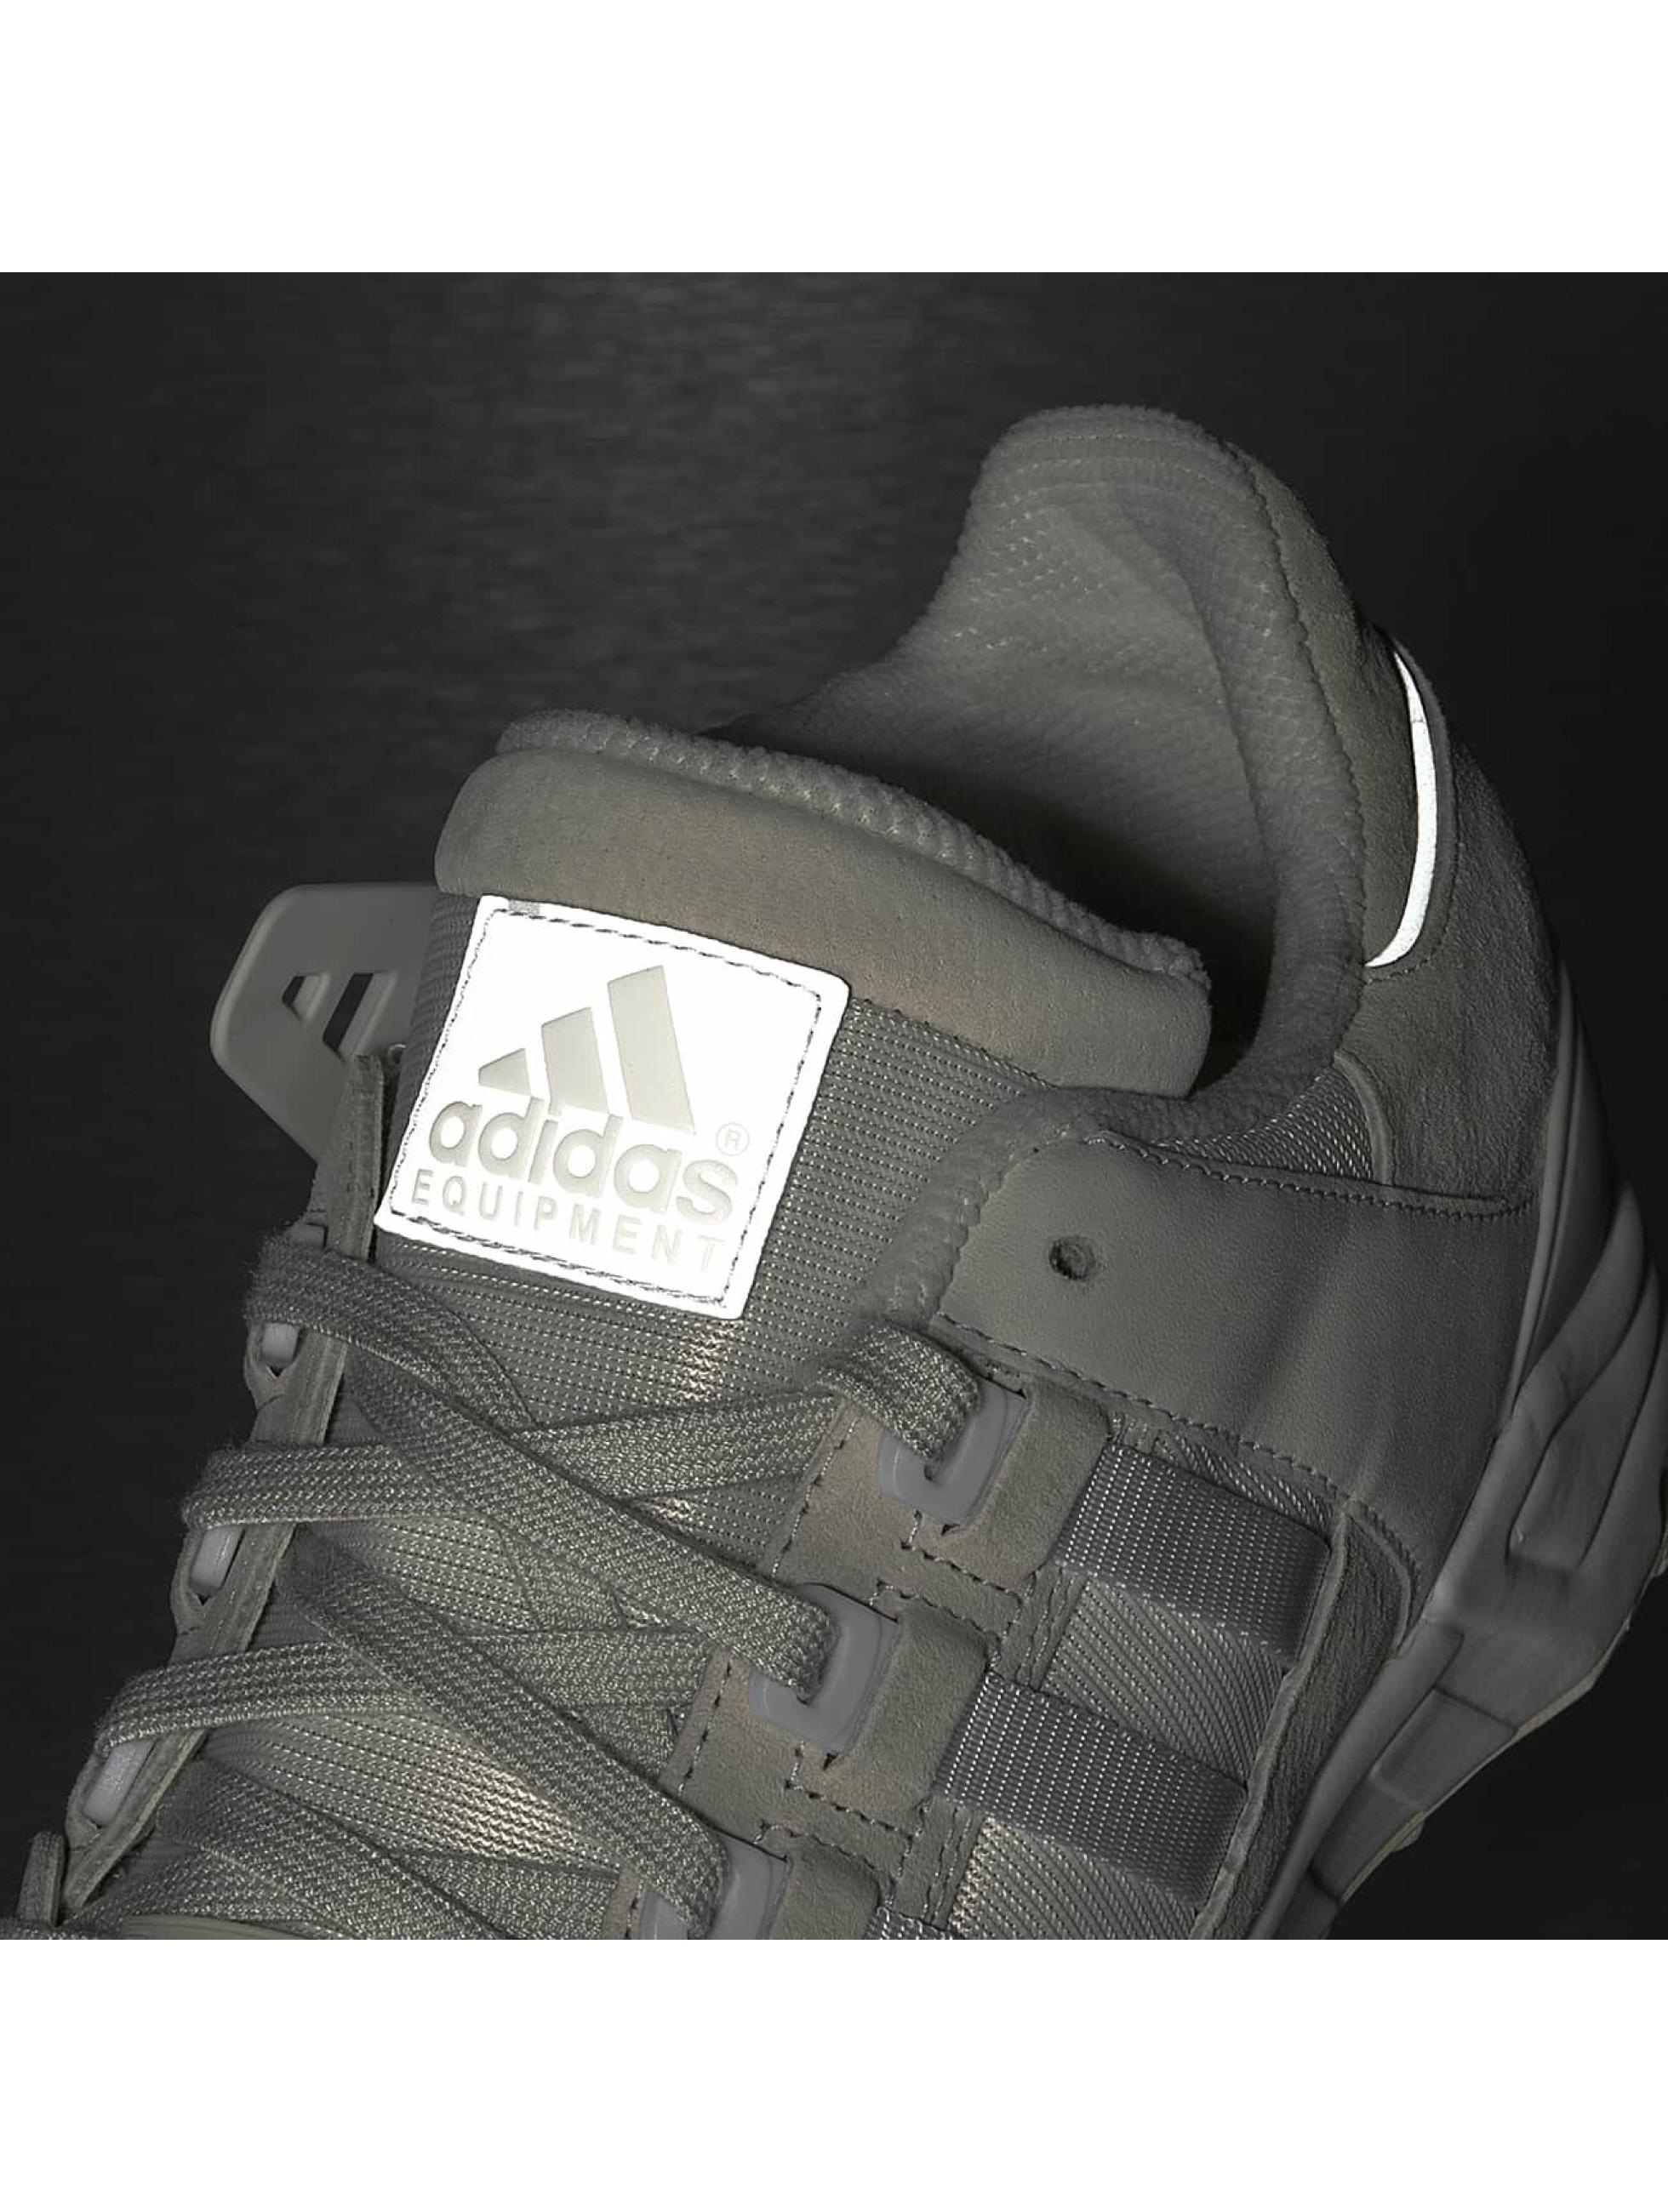 adidas originals Tennarit Equipment valkoinen